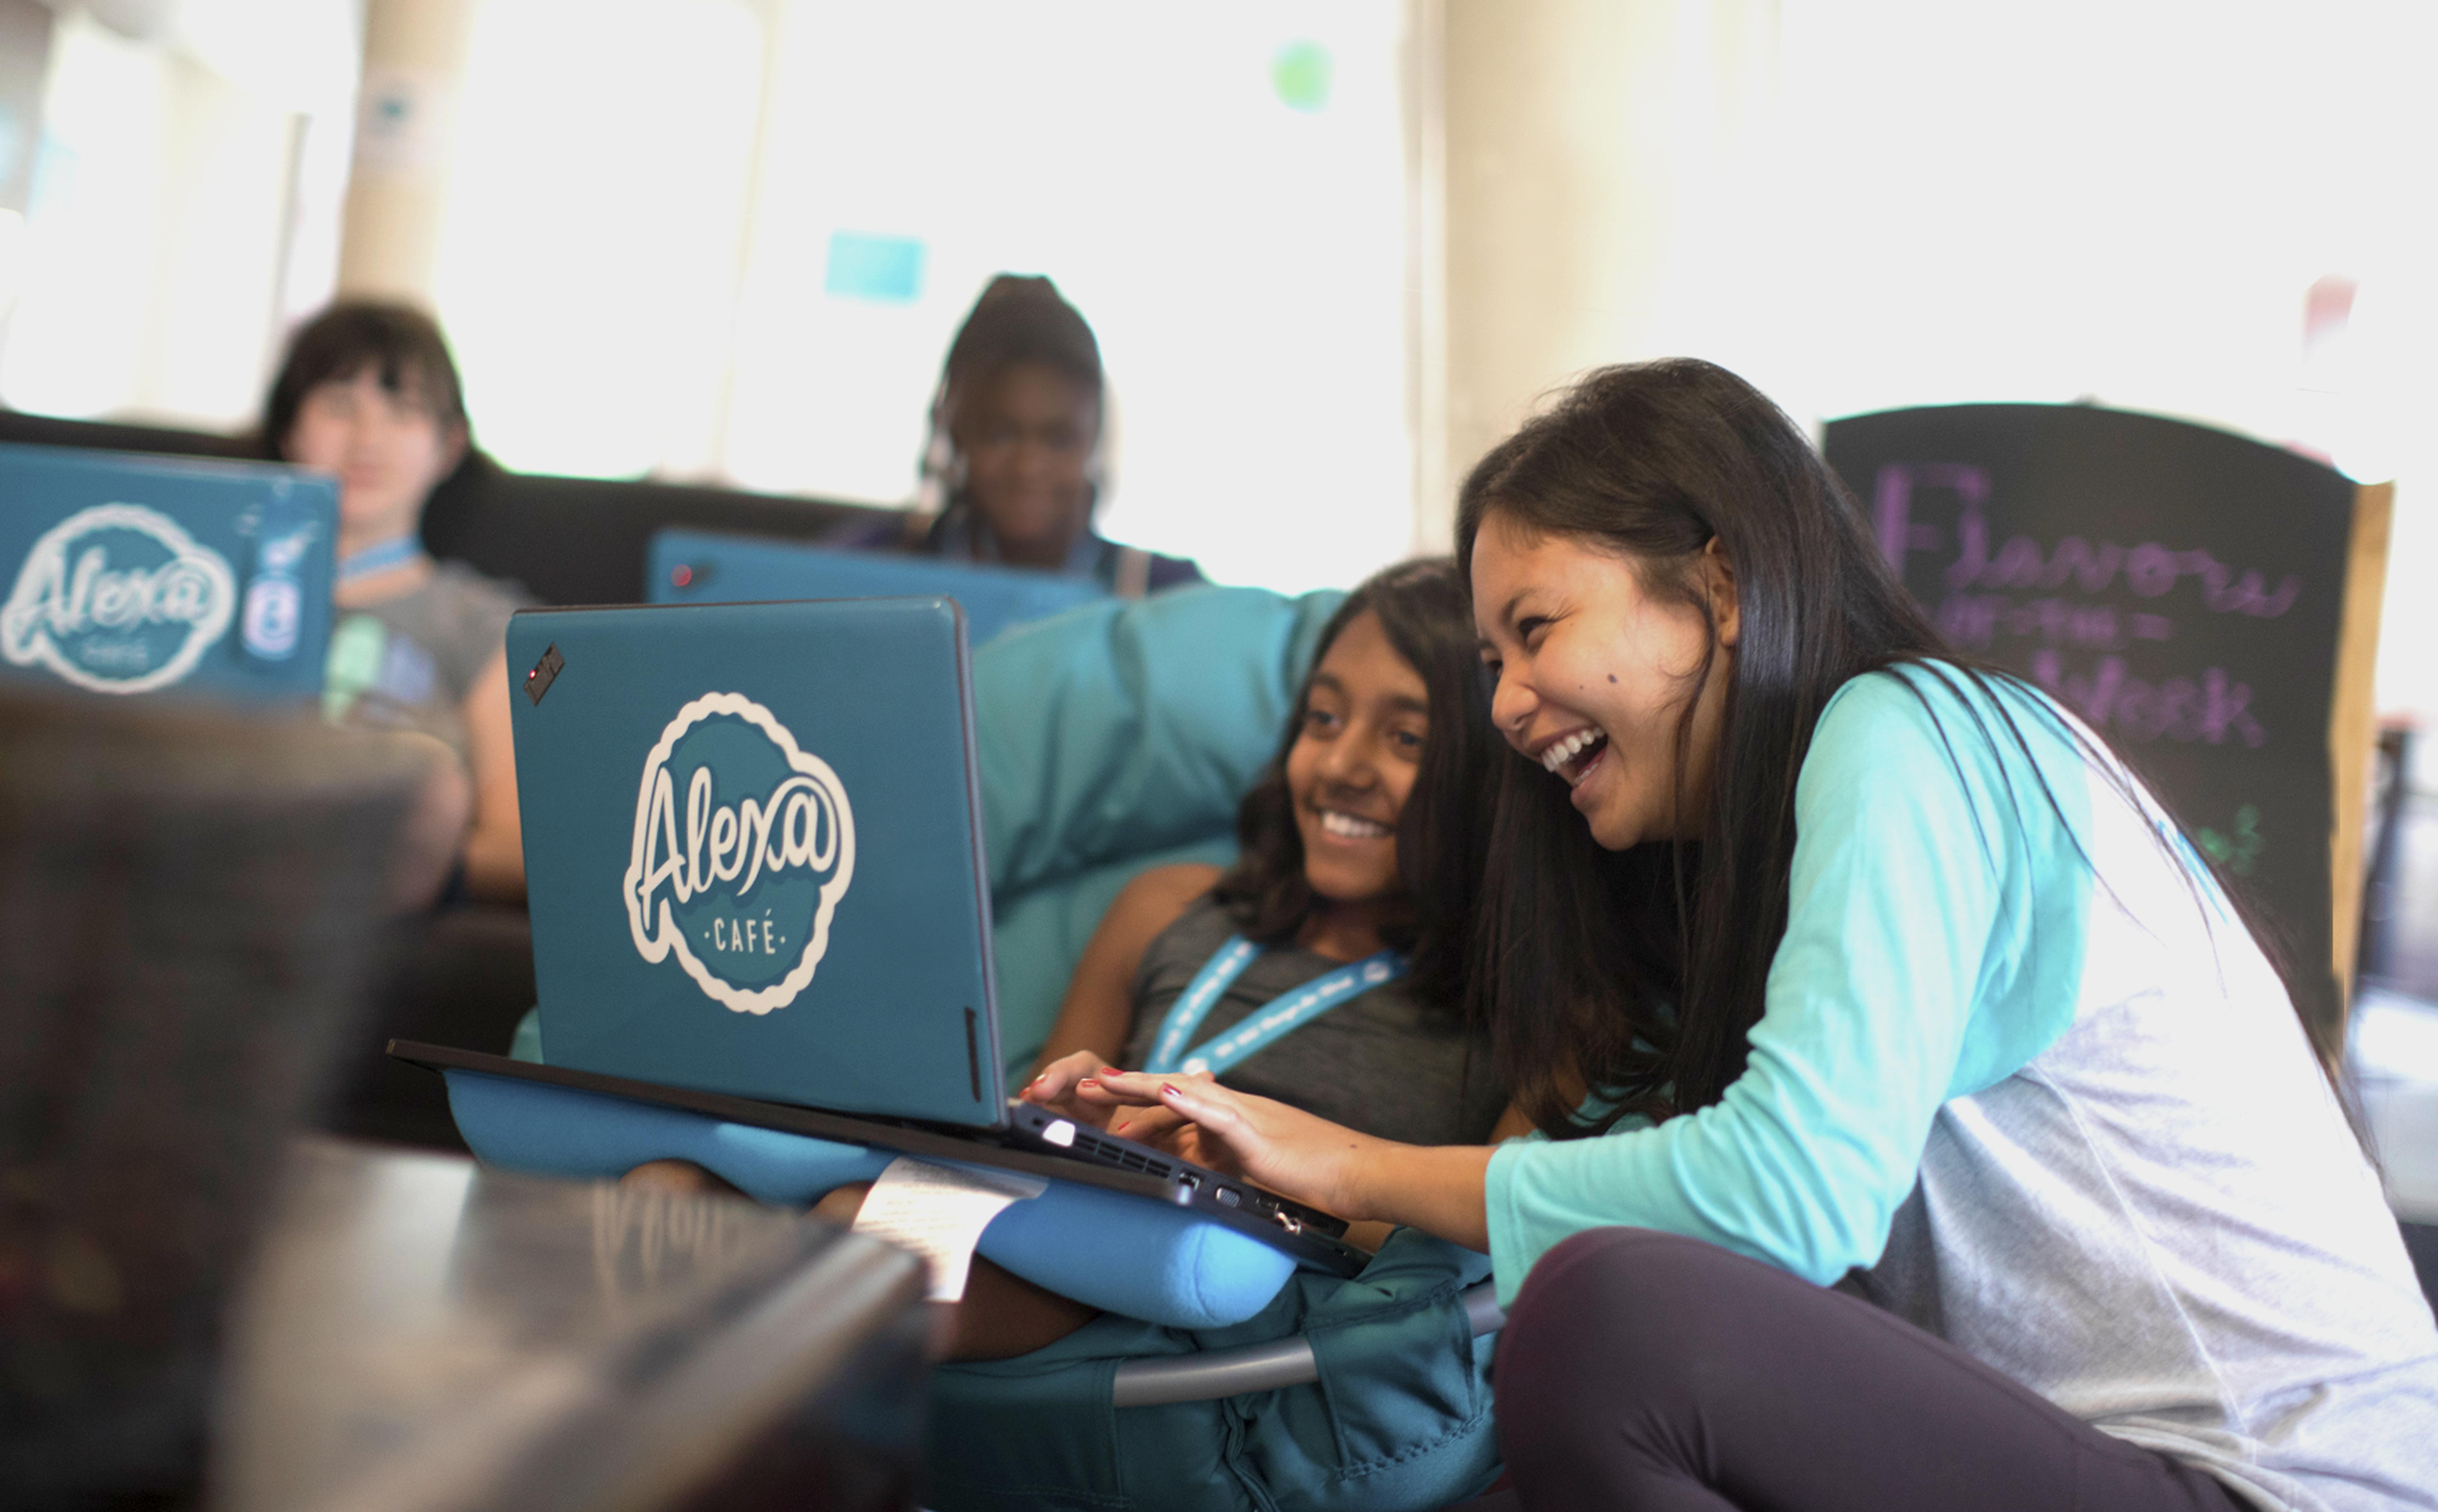 Summer Program - Computer Science | Alexa Cafe: All-Girls STEM Camp | Held at Kent Place School